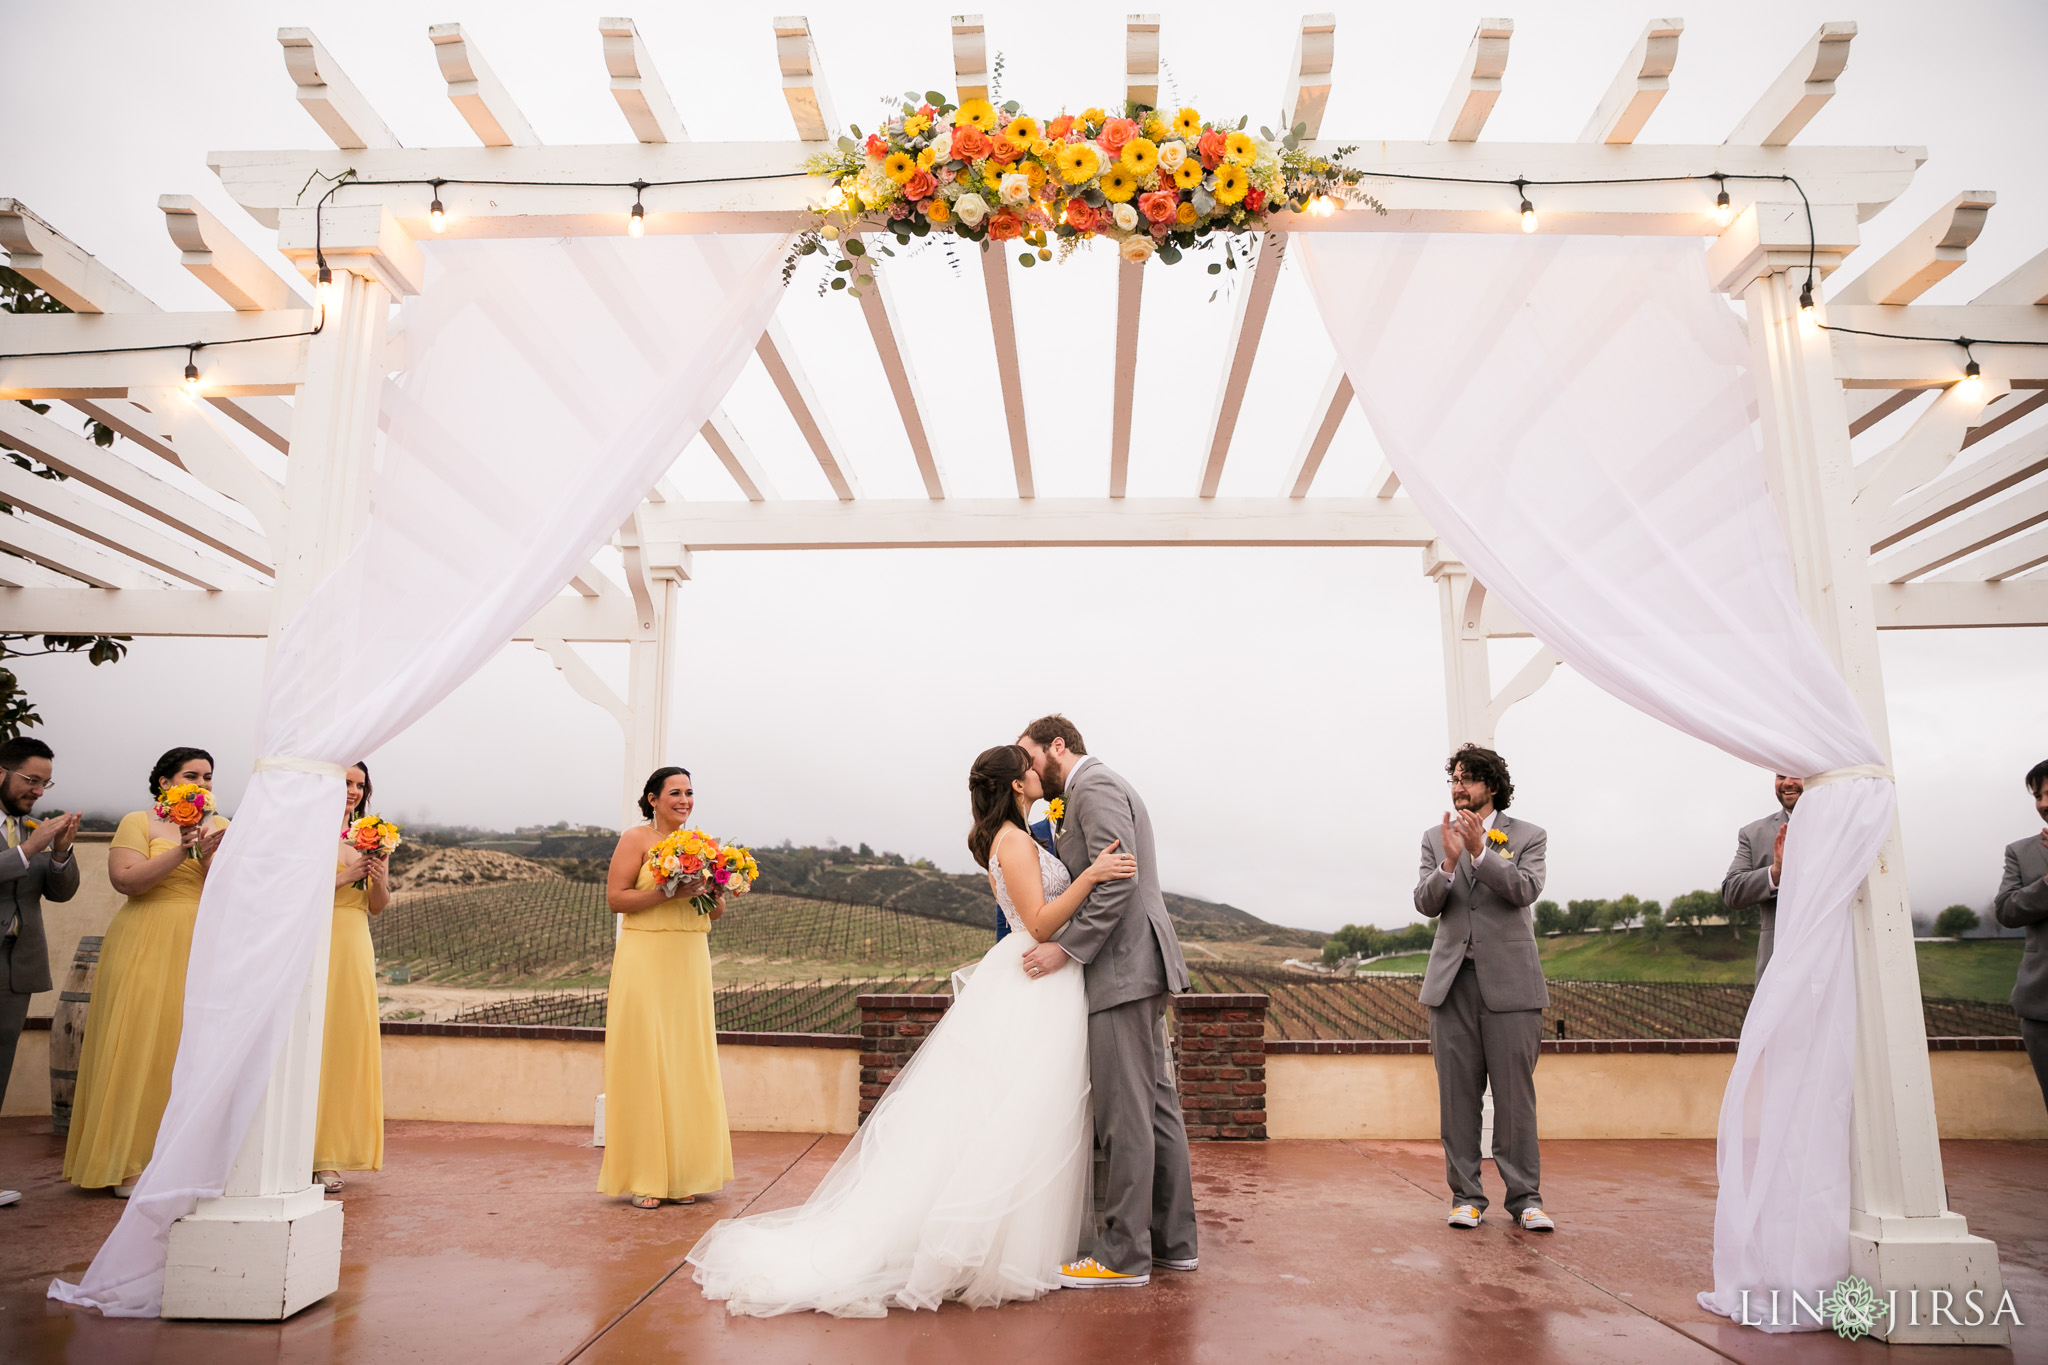 25 leoness cellars temecula wedding ceremony photography